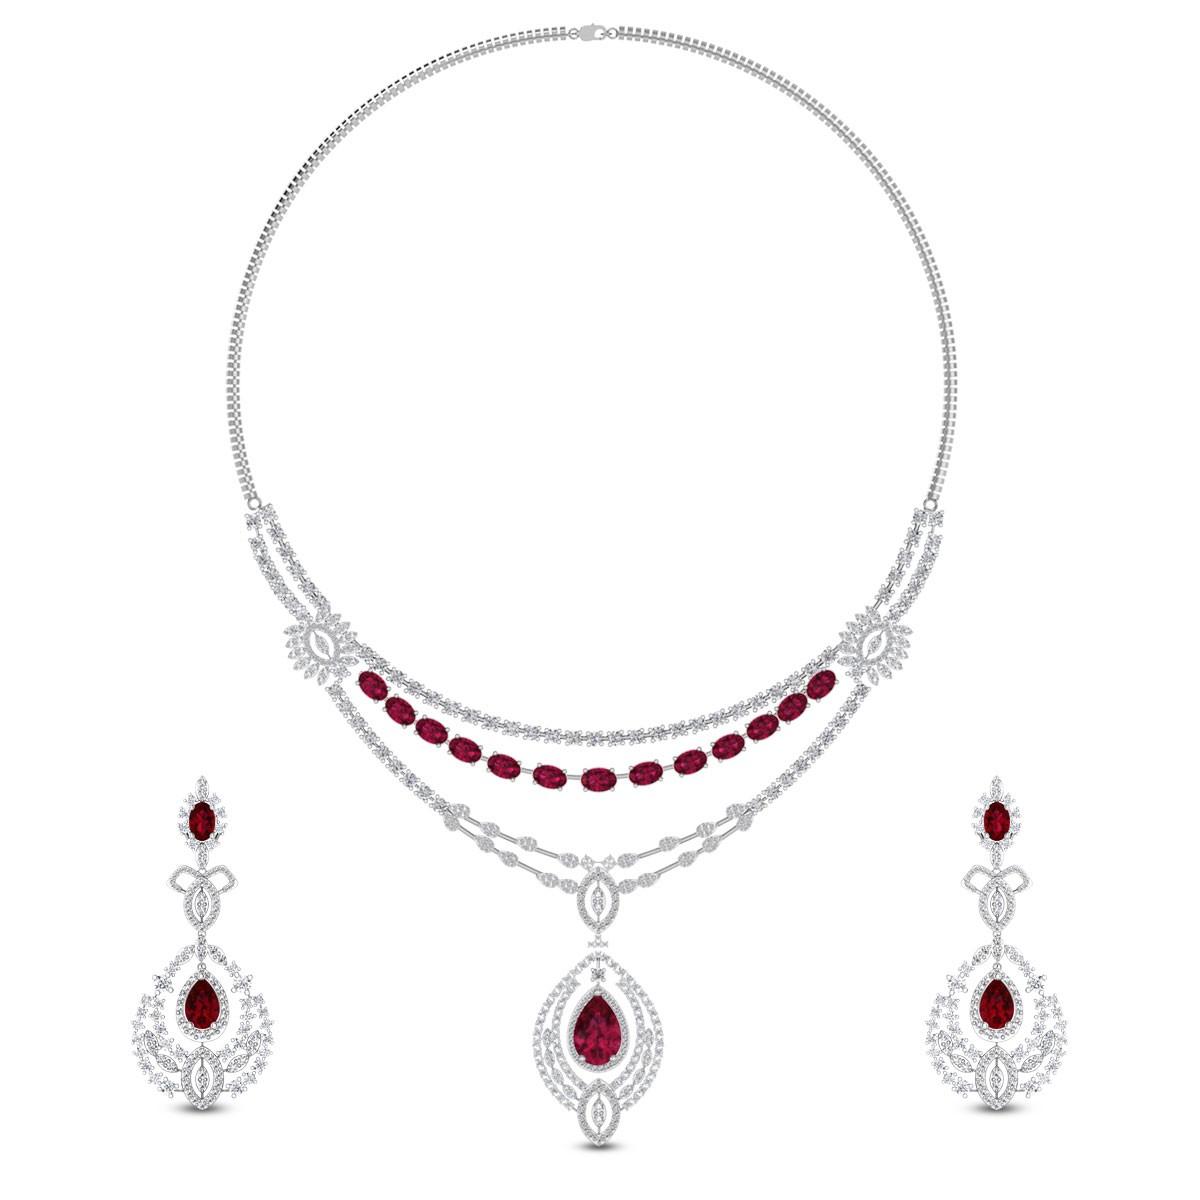 Kannika Diamond and Ruby Necklace Set